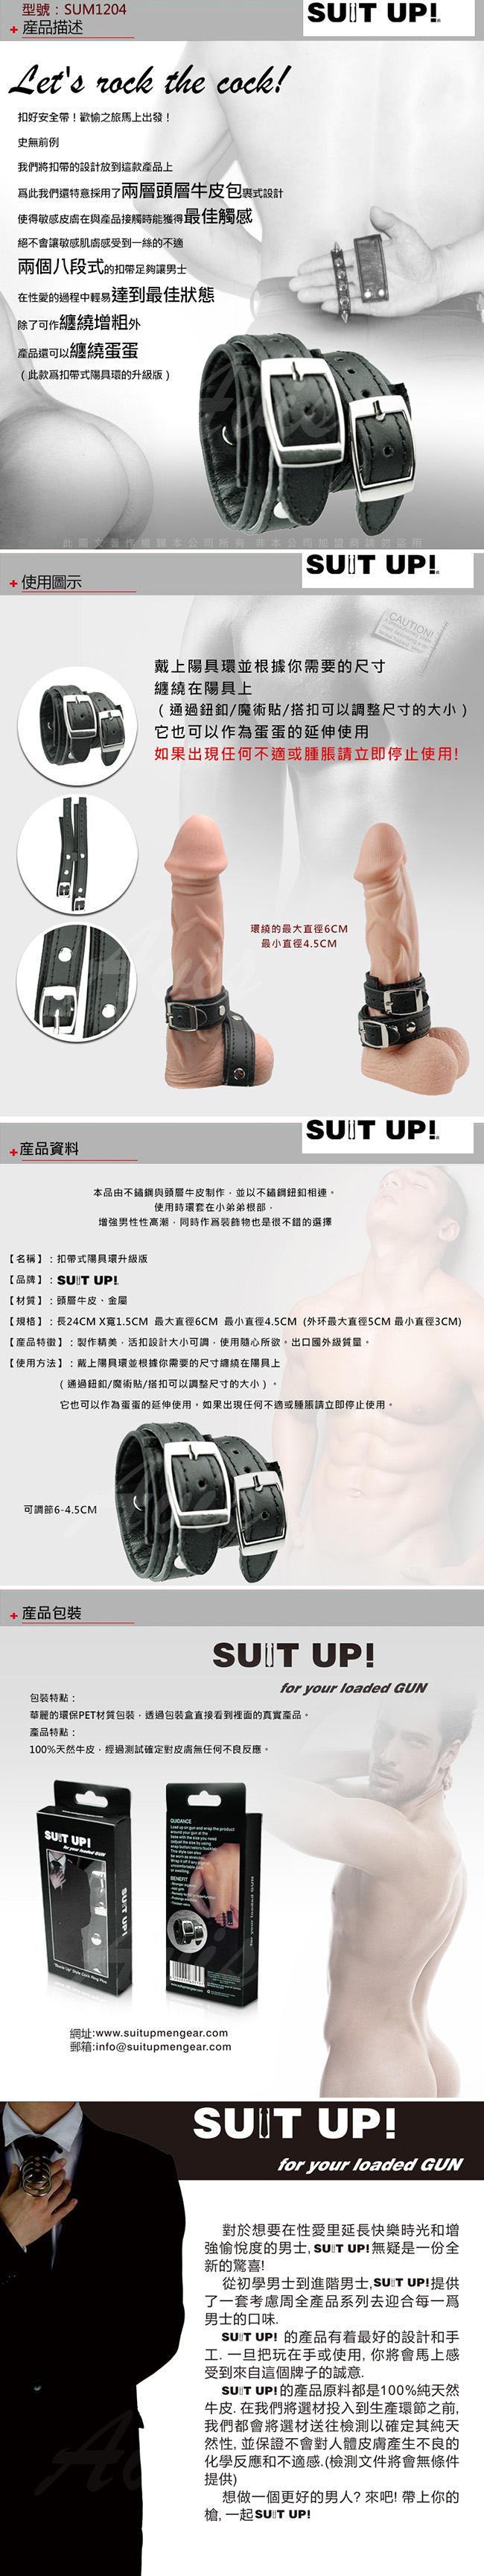 SUIT UP! SM情趣 扣帶式陽具環升級版